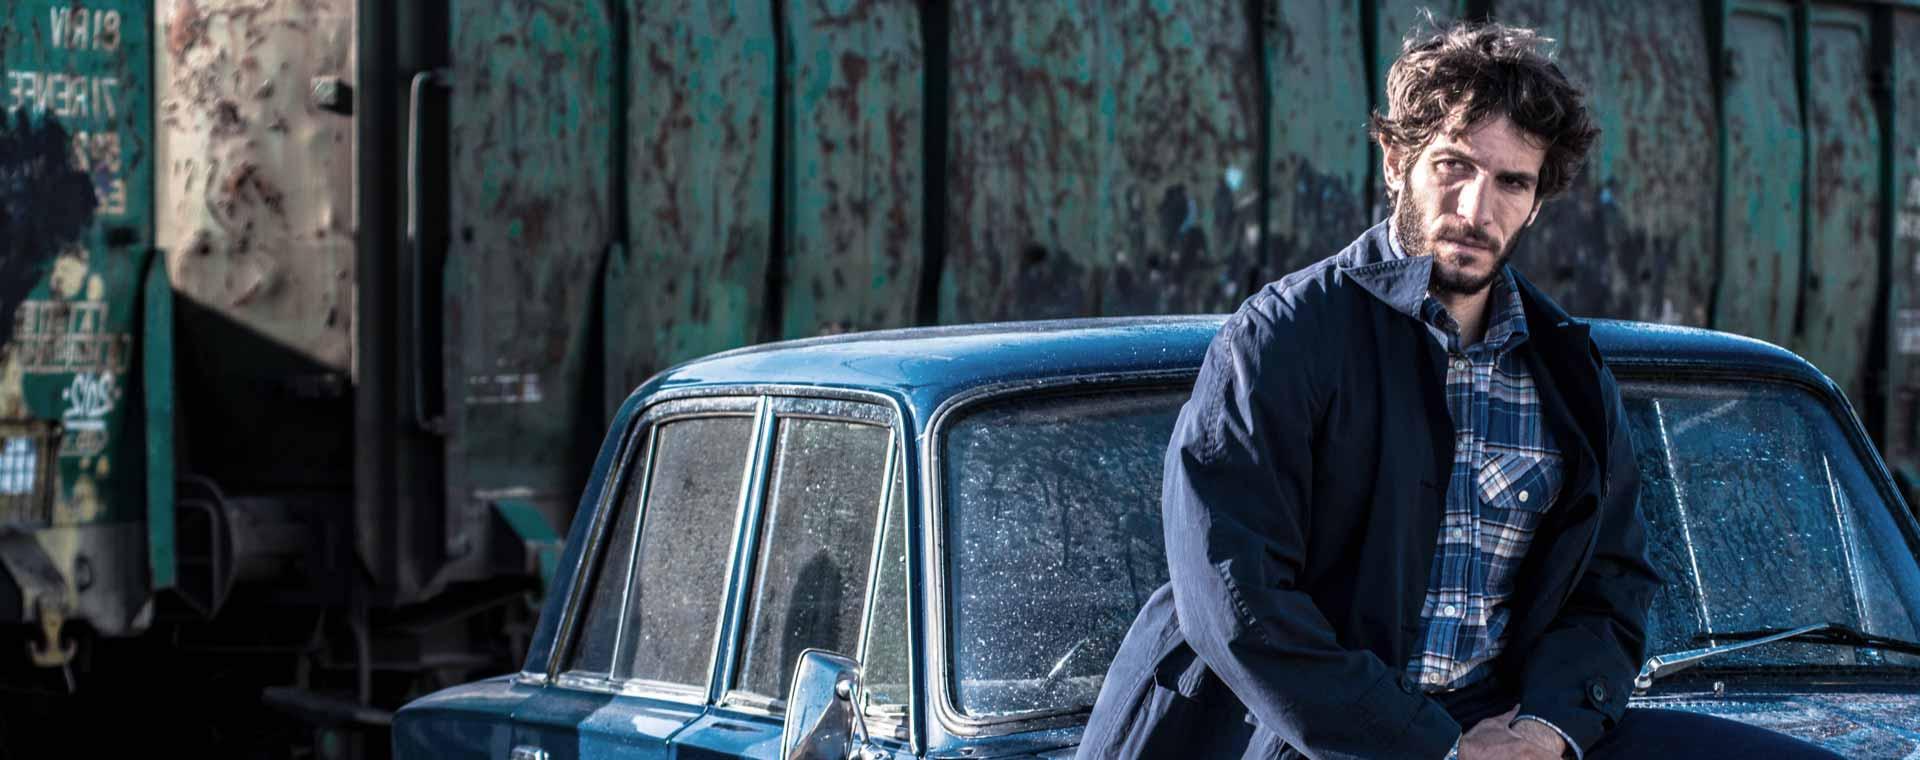 Mediaset estrena 'El padre de Caín'